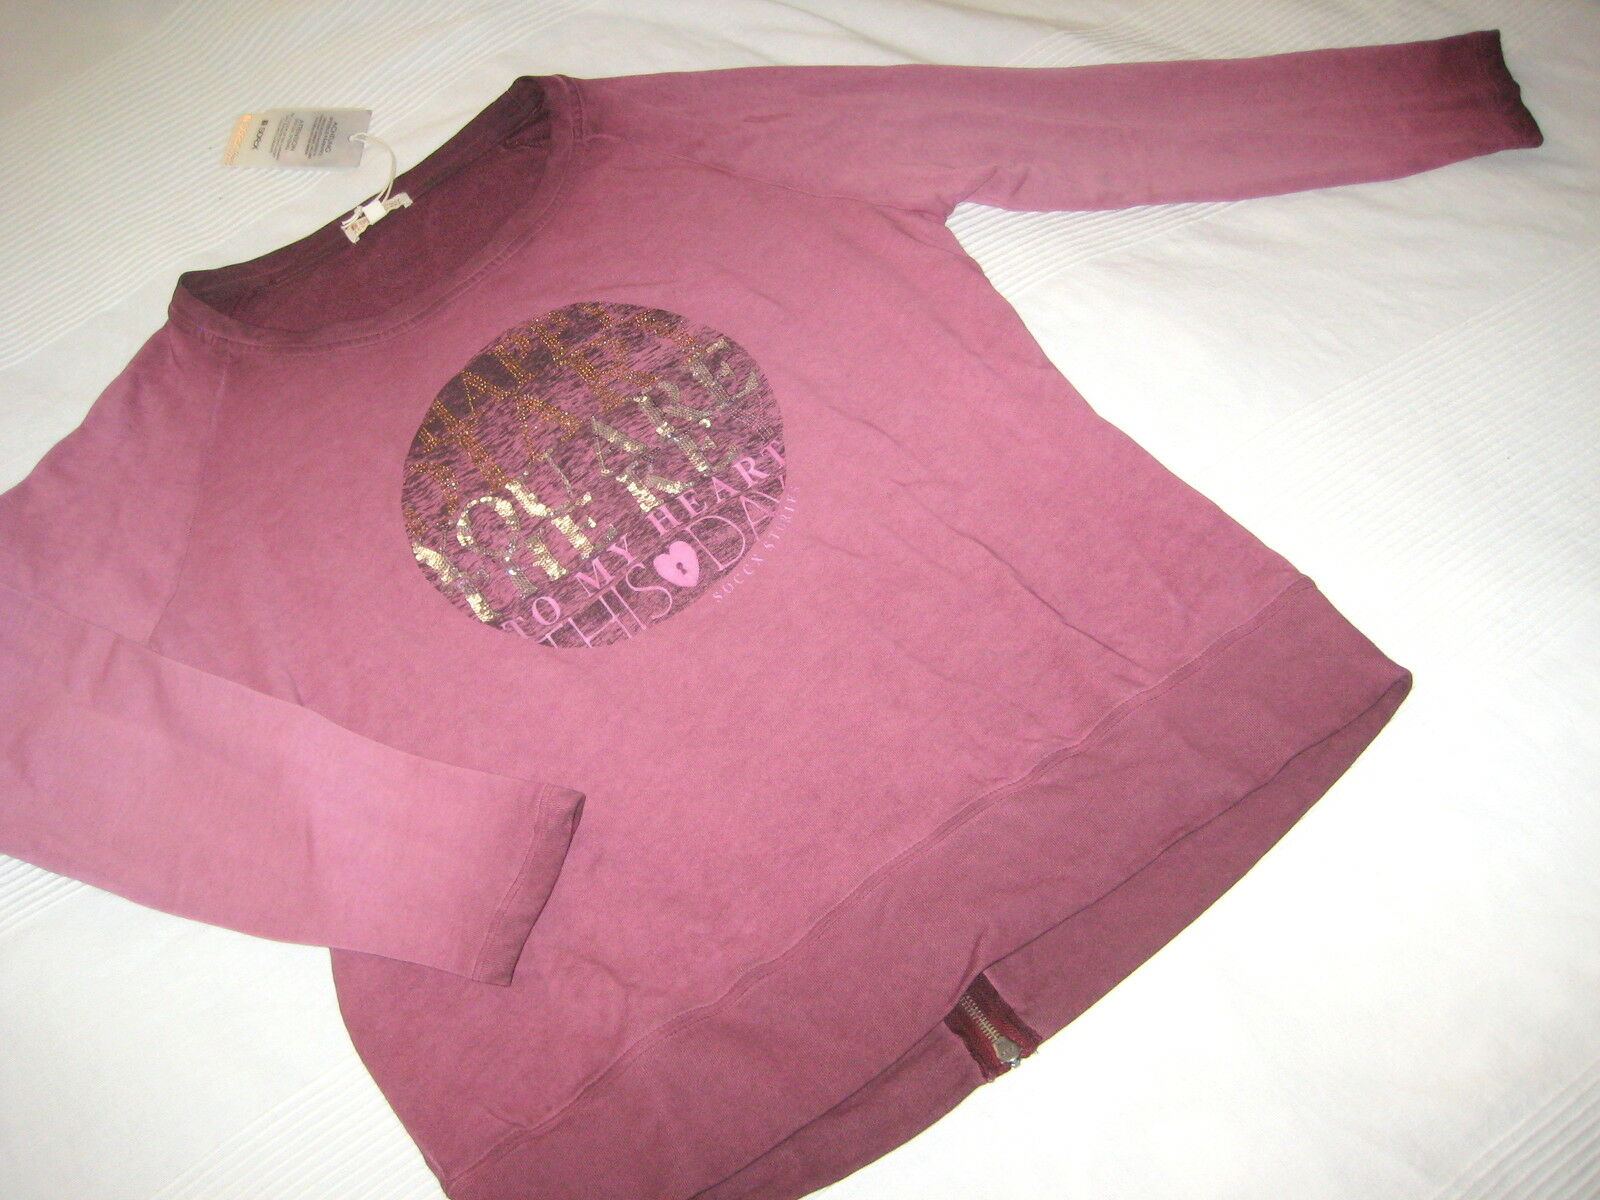 SOCCX Sweat SHIRT Autumn Diaries burgundy red Gr. L 40 42 NEU Pailletten